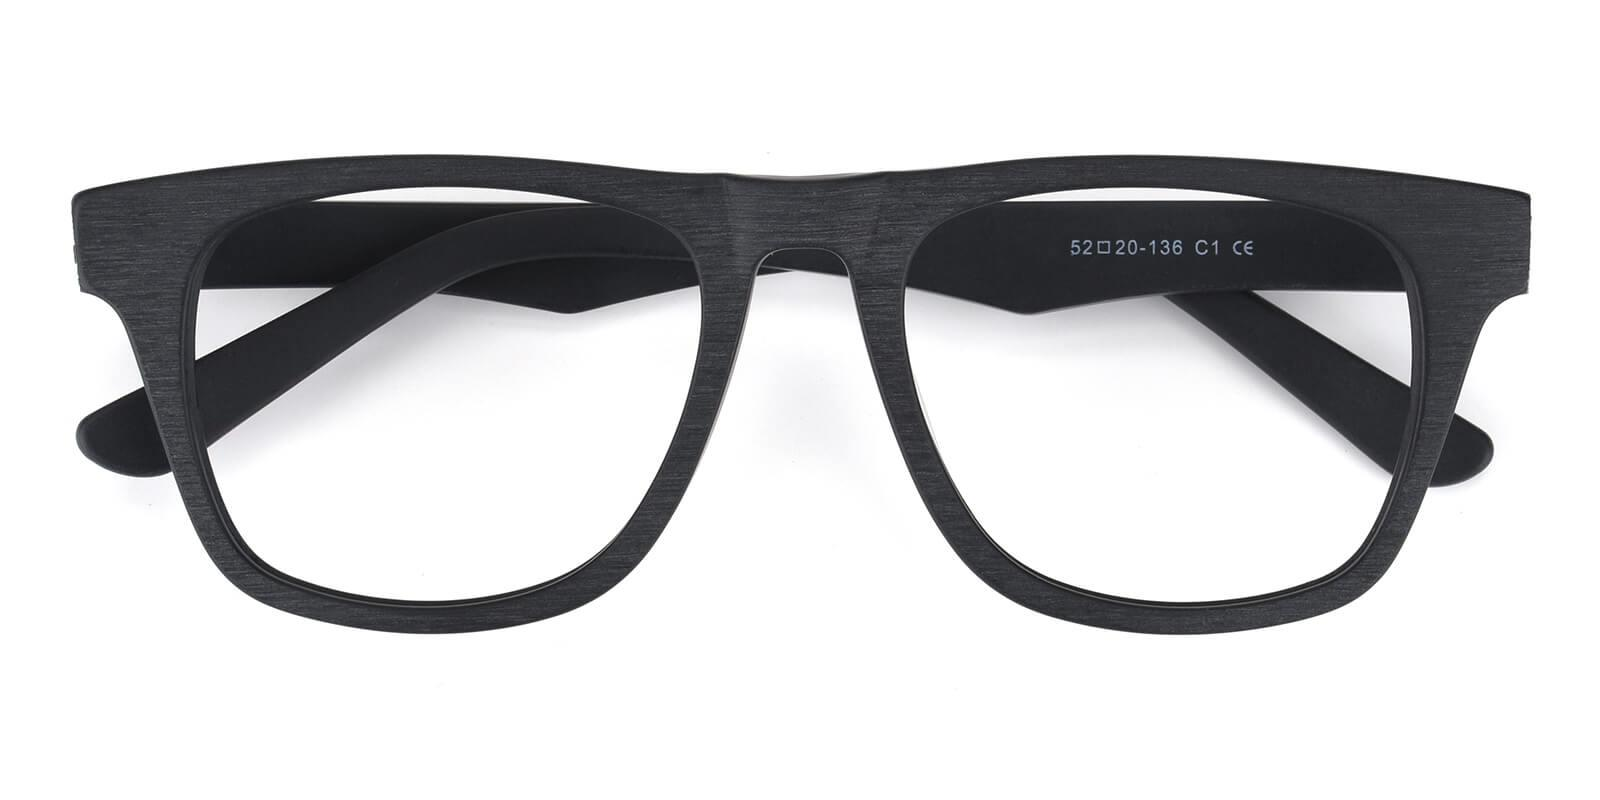 Nashive-Black-Rectangle-Acetate-Eyeglasses-detail